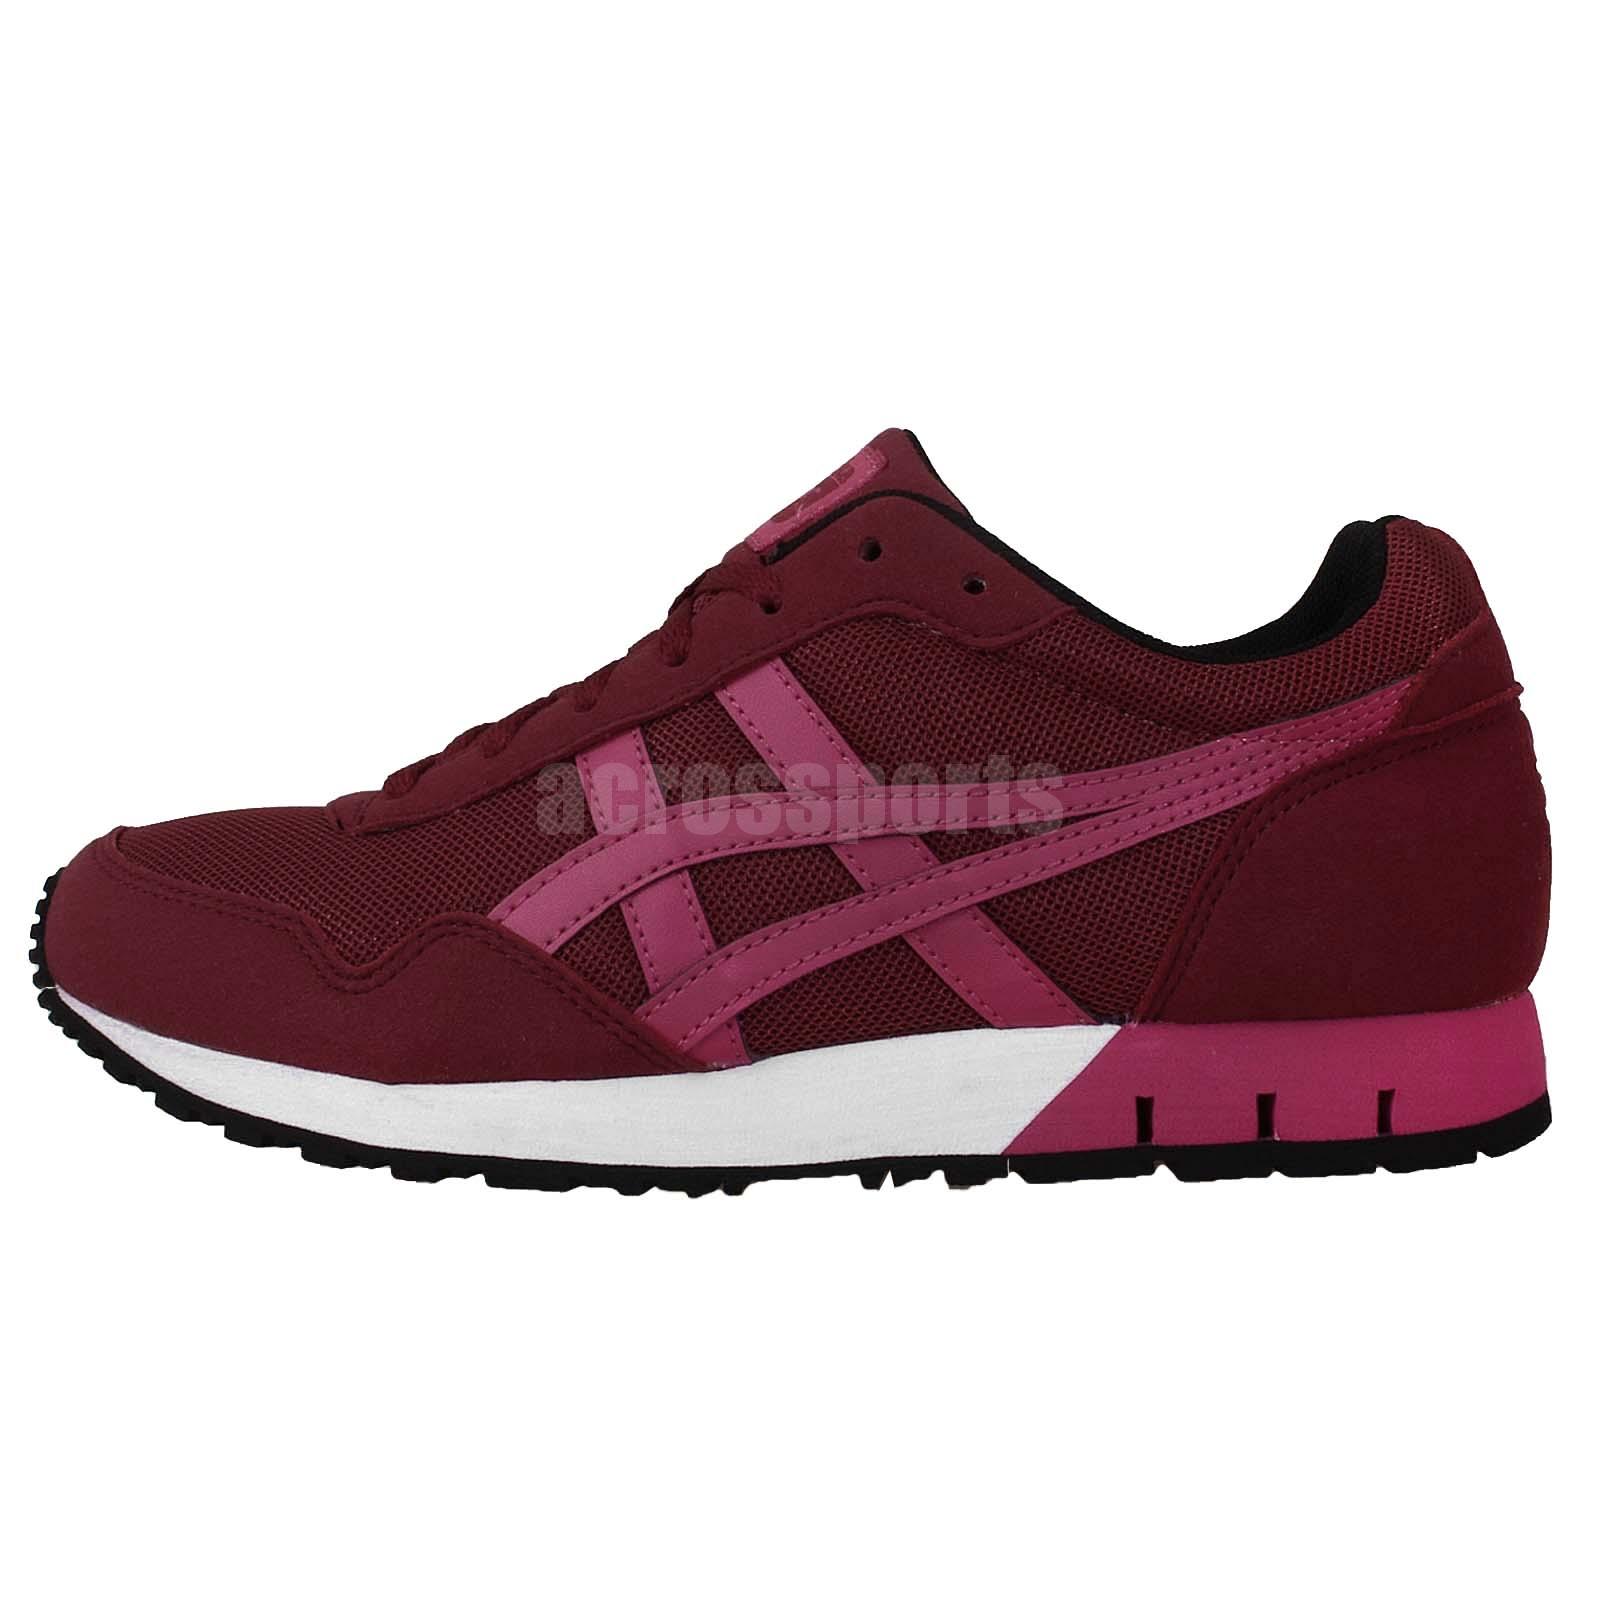 asics onitsuka tiger curreo 2014 womens retro running